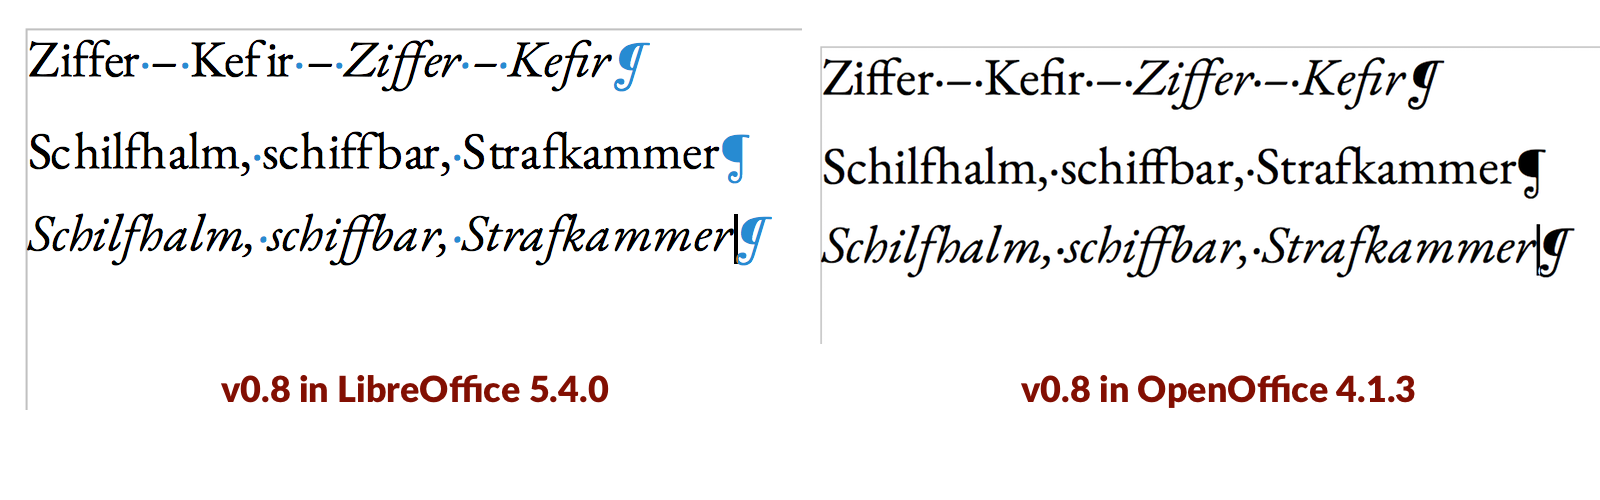 Inconsistent line spacing between styles in LibreOffice/OpenOffice